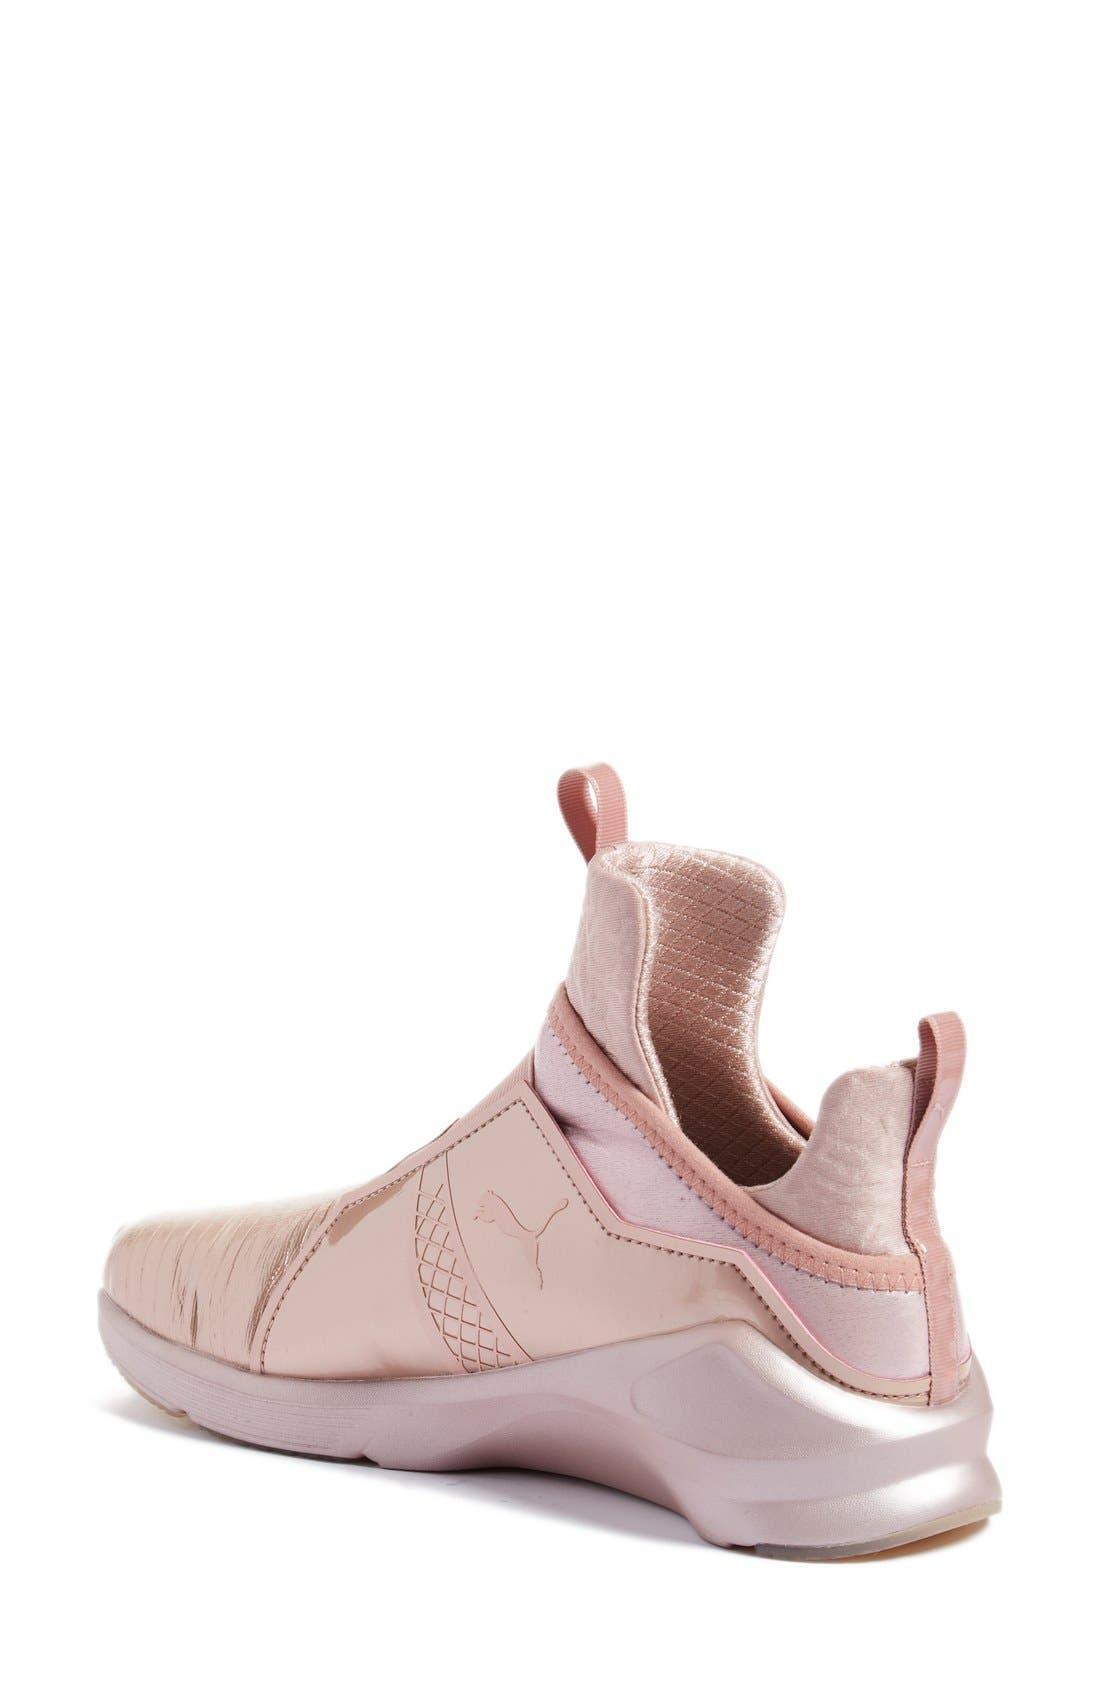 Fierce Metallic High Top Sneaker,                             Alternate thumbnail 2, color,                             Rose Gold